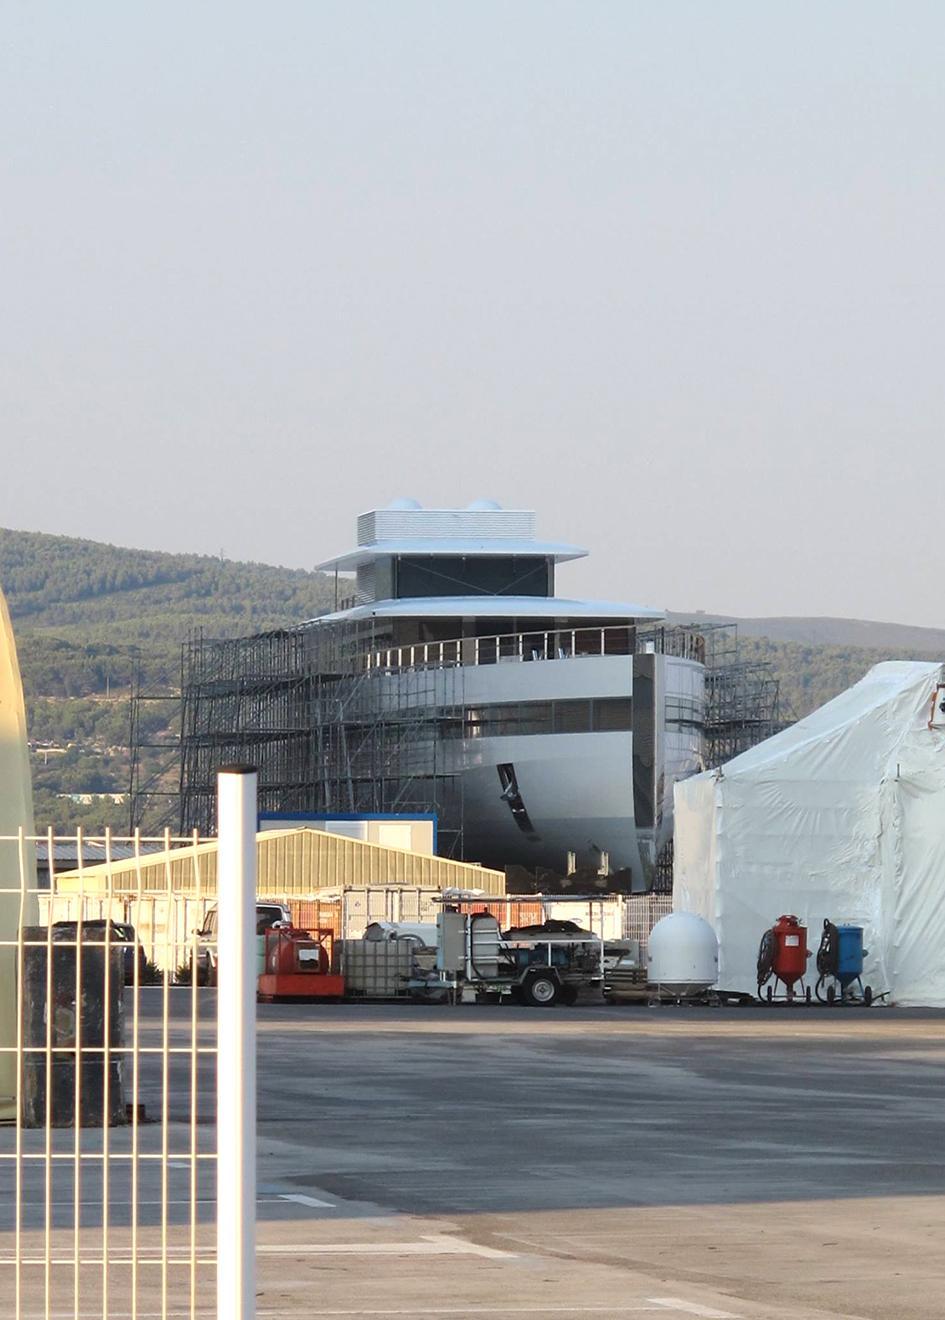 steve jobs Inside Steve Jobs' Luxury Yacht bCN9aKulRB2g4qgAban0 portrait venus yacht refit